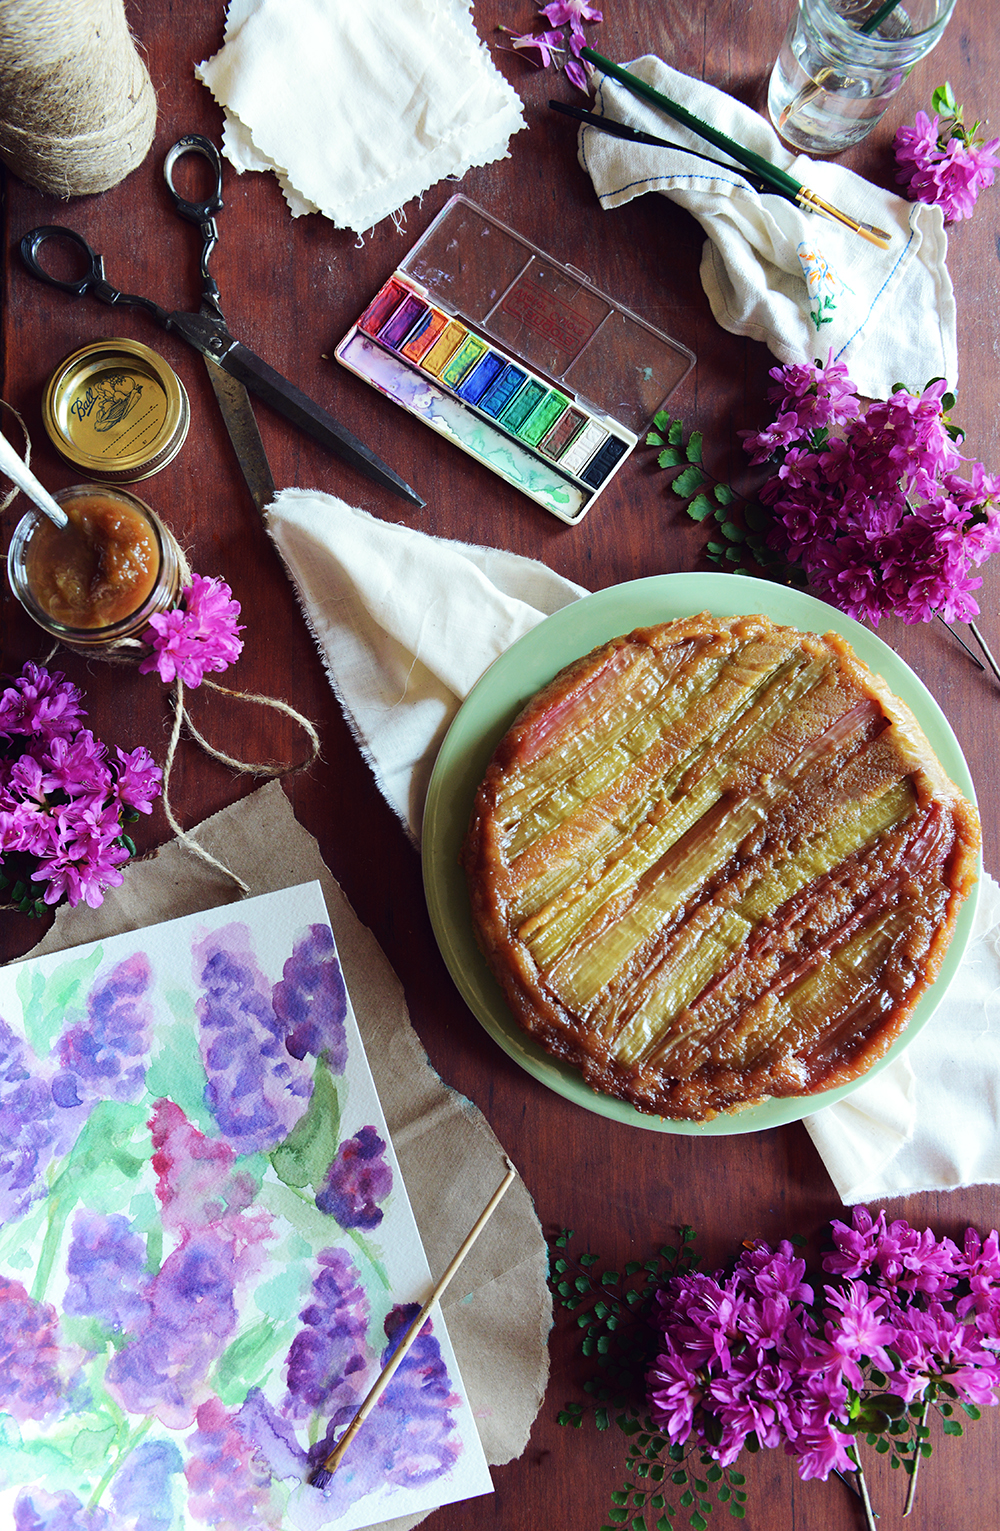 An Ode to Motherhood: Whole Wheat Rhubarb Upside Down Cake & Rhubarb Compote